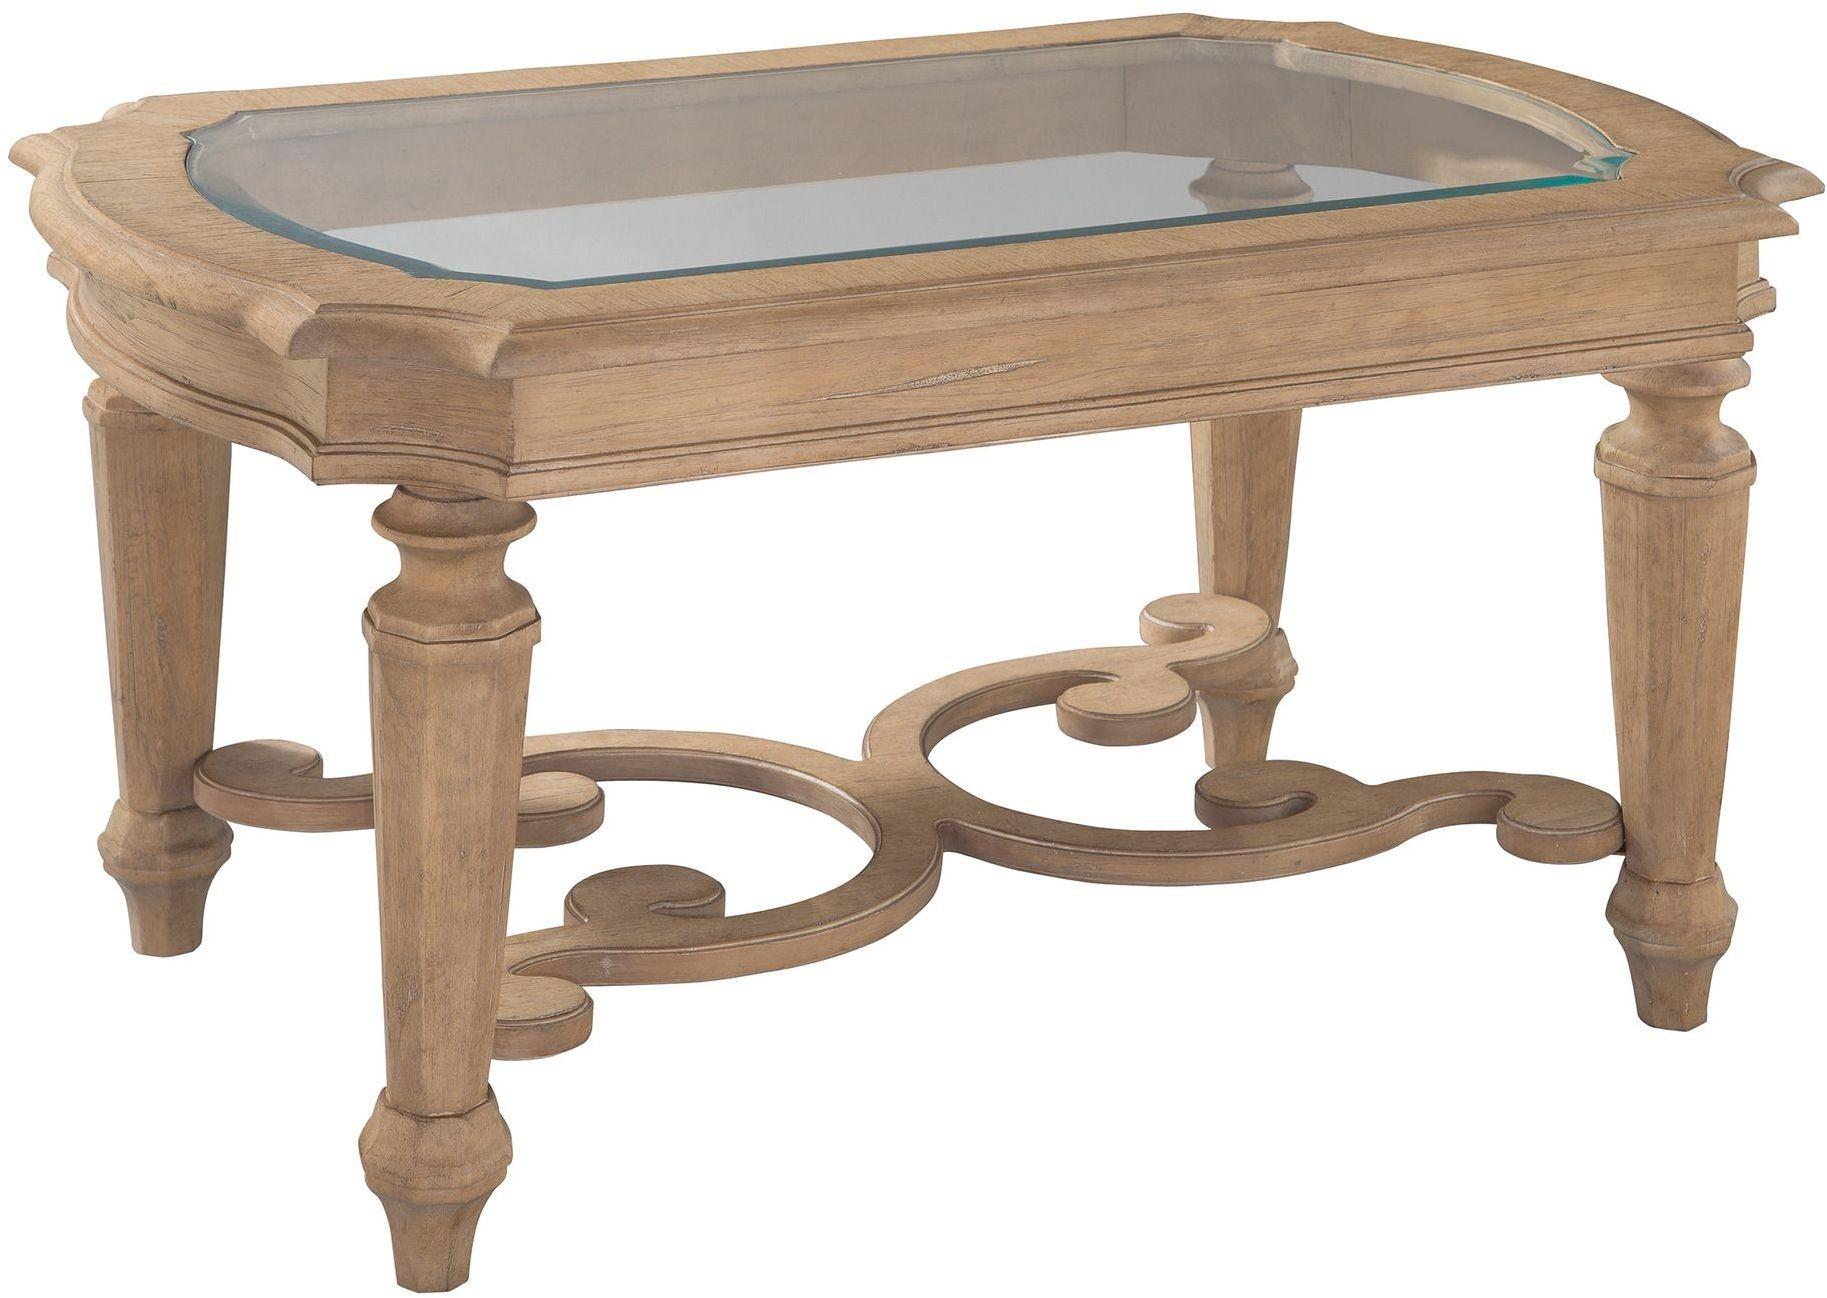 Grand Vista Brown Rectangular Glass Top Coffee Table From Hekman Furniture Coleman Furniture